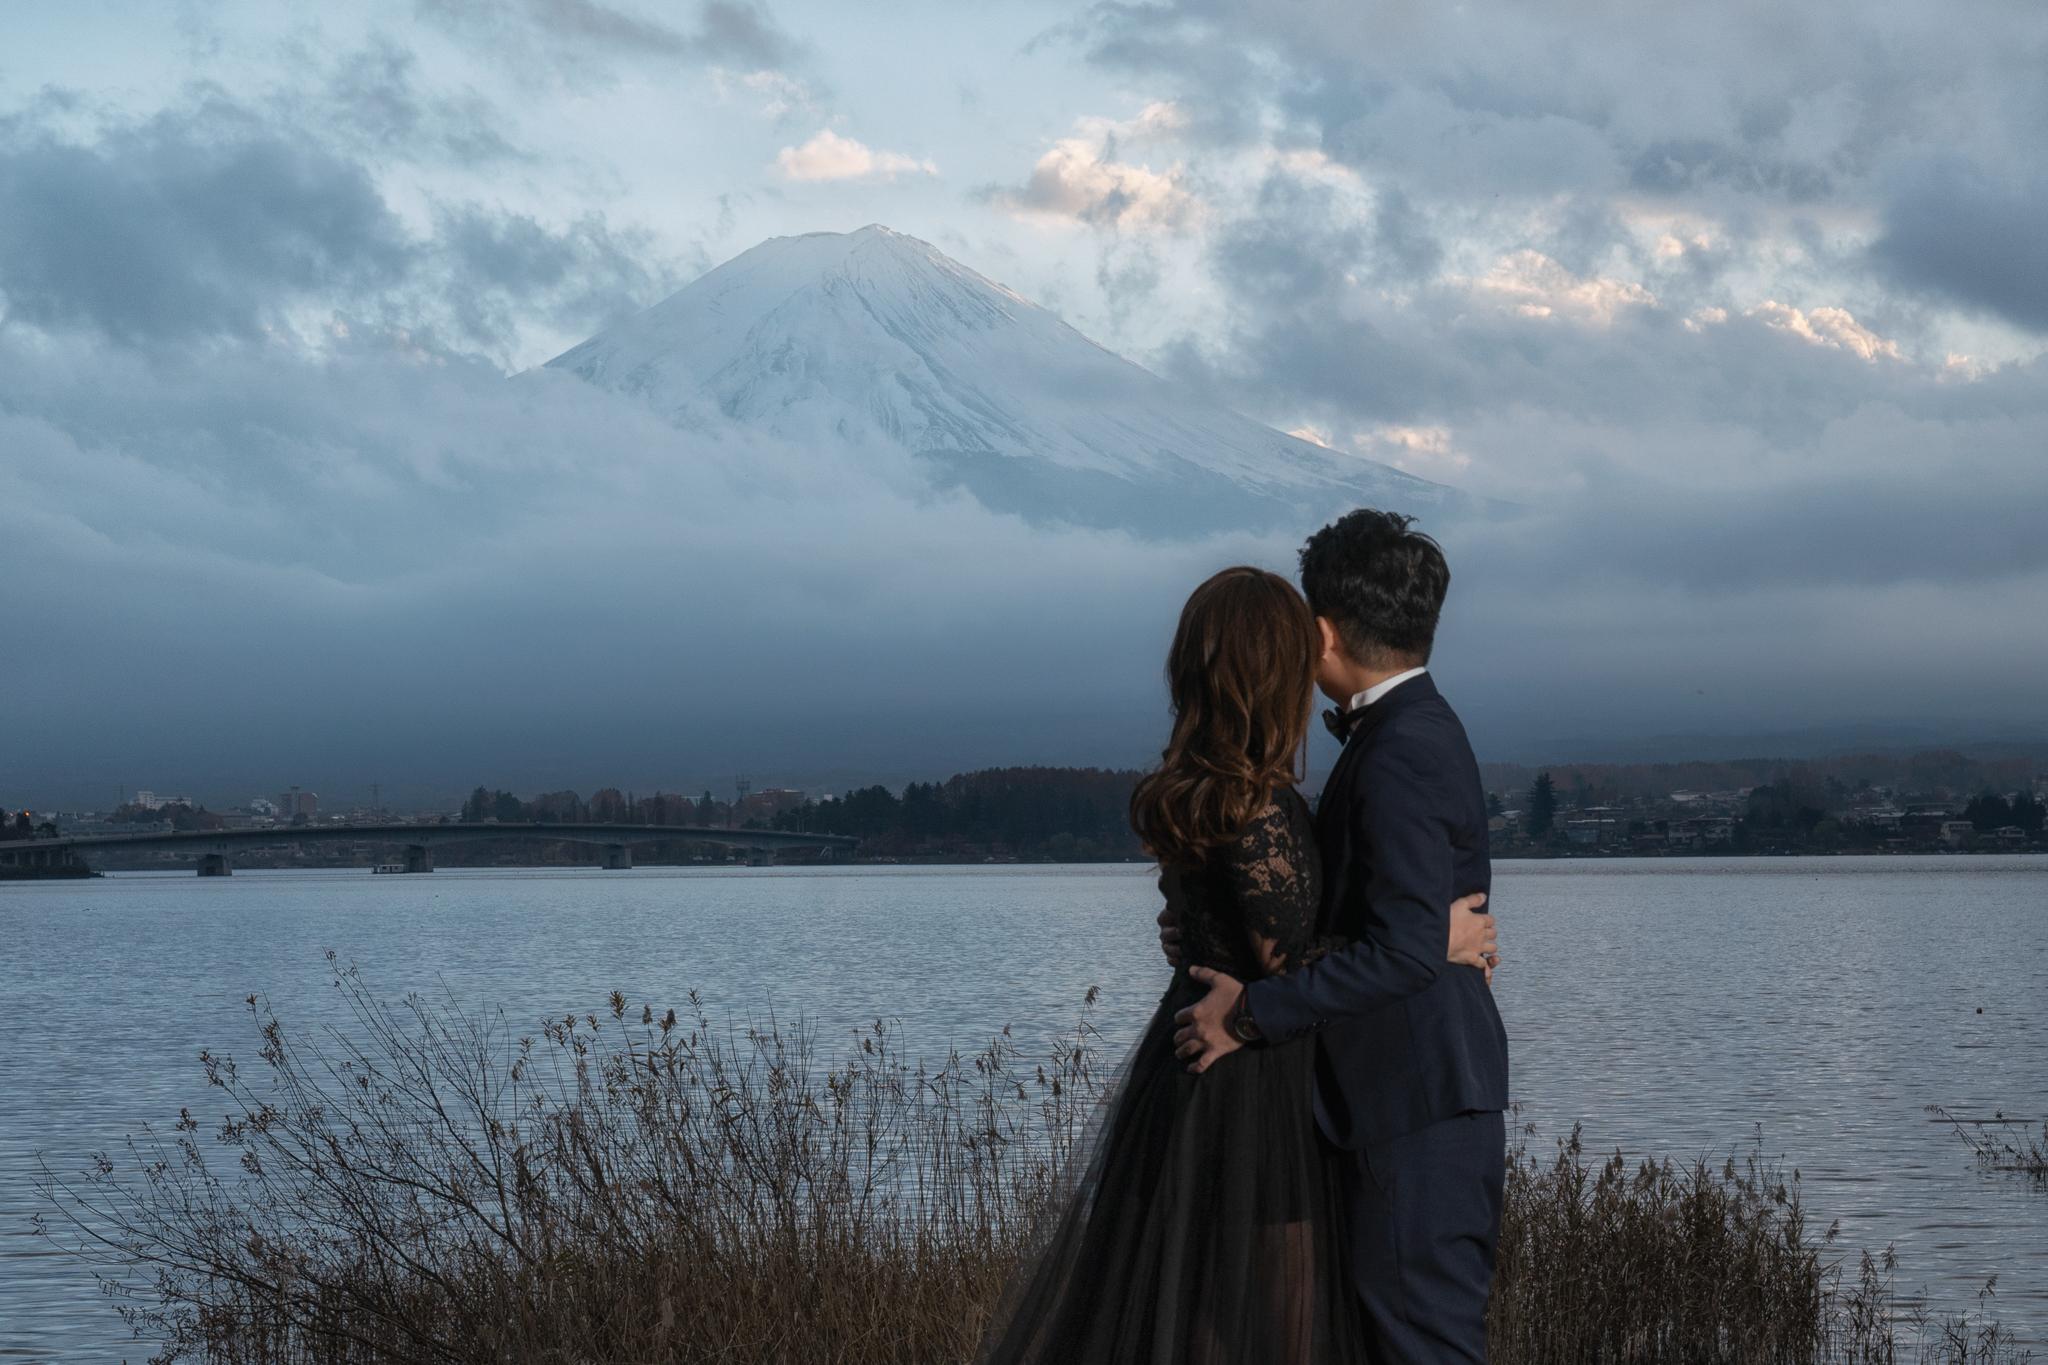 EASTERN WEDDING, 東法, Donfer, 東京婚紗, 河口湖, 汐留 , 銀杏婚紗, 楓葉婚紗